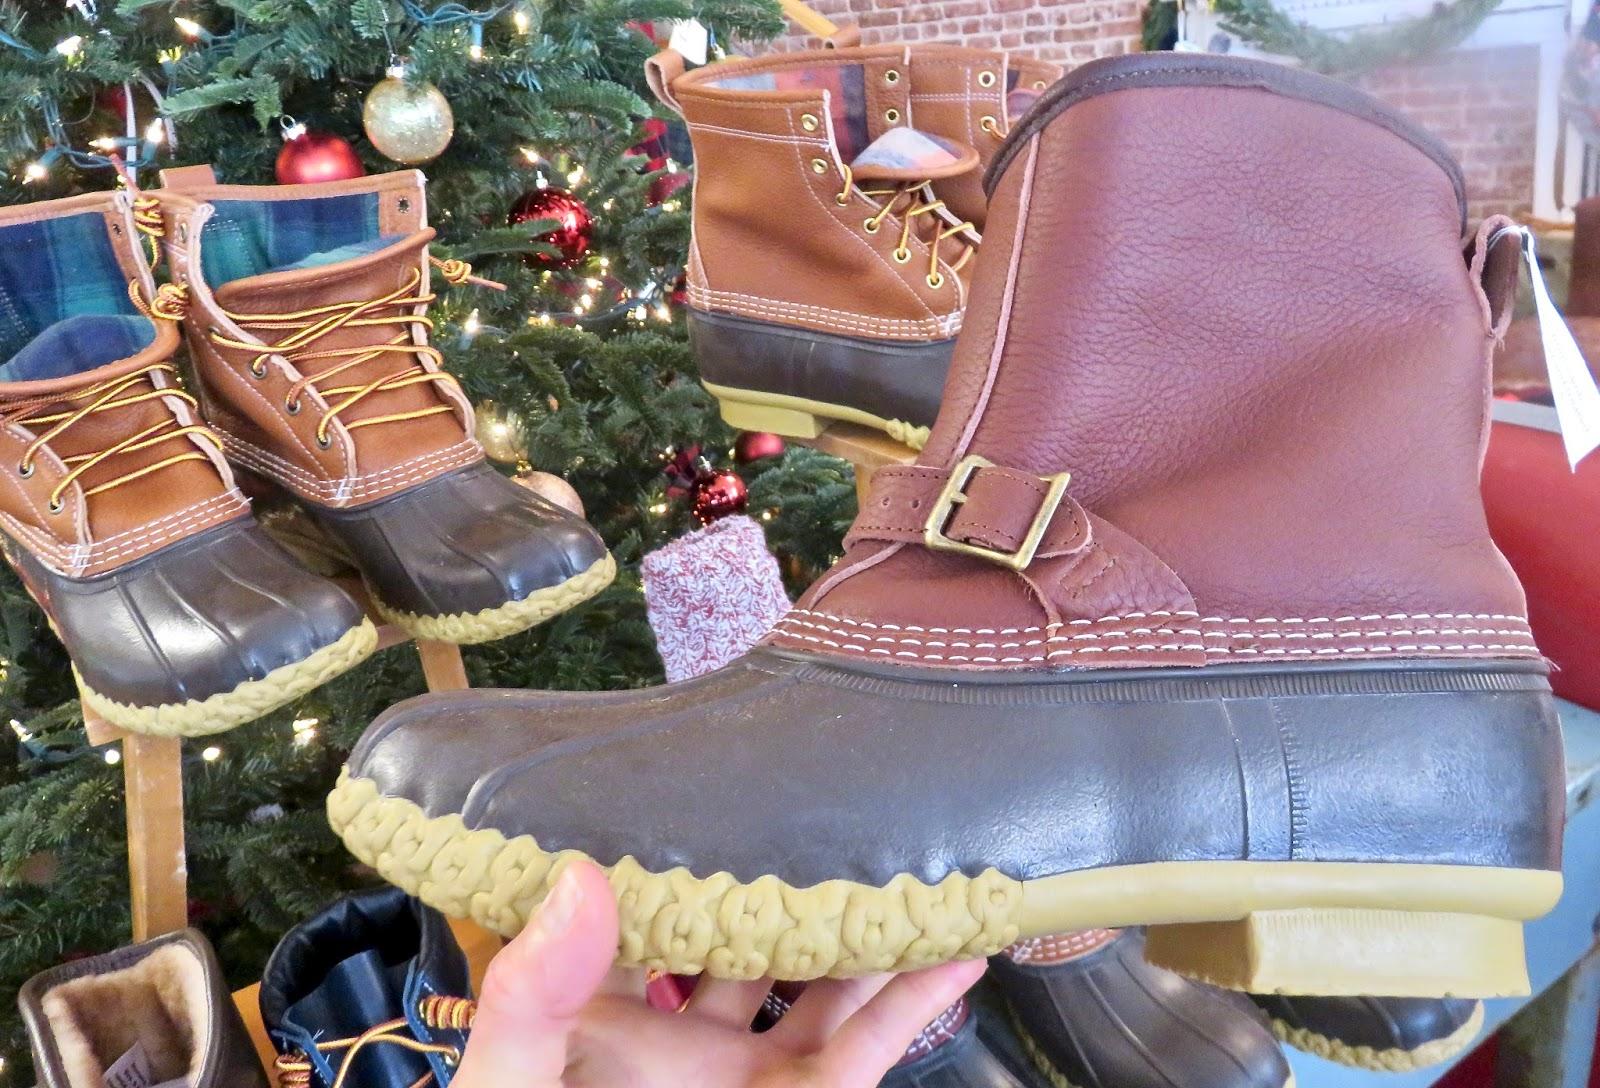 df0f01b68cd L.L.BEAN ORIGINAL BOOTS: Classics, New Styles-and Available!